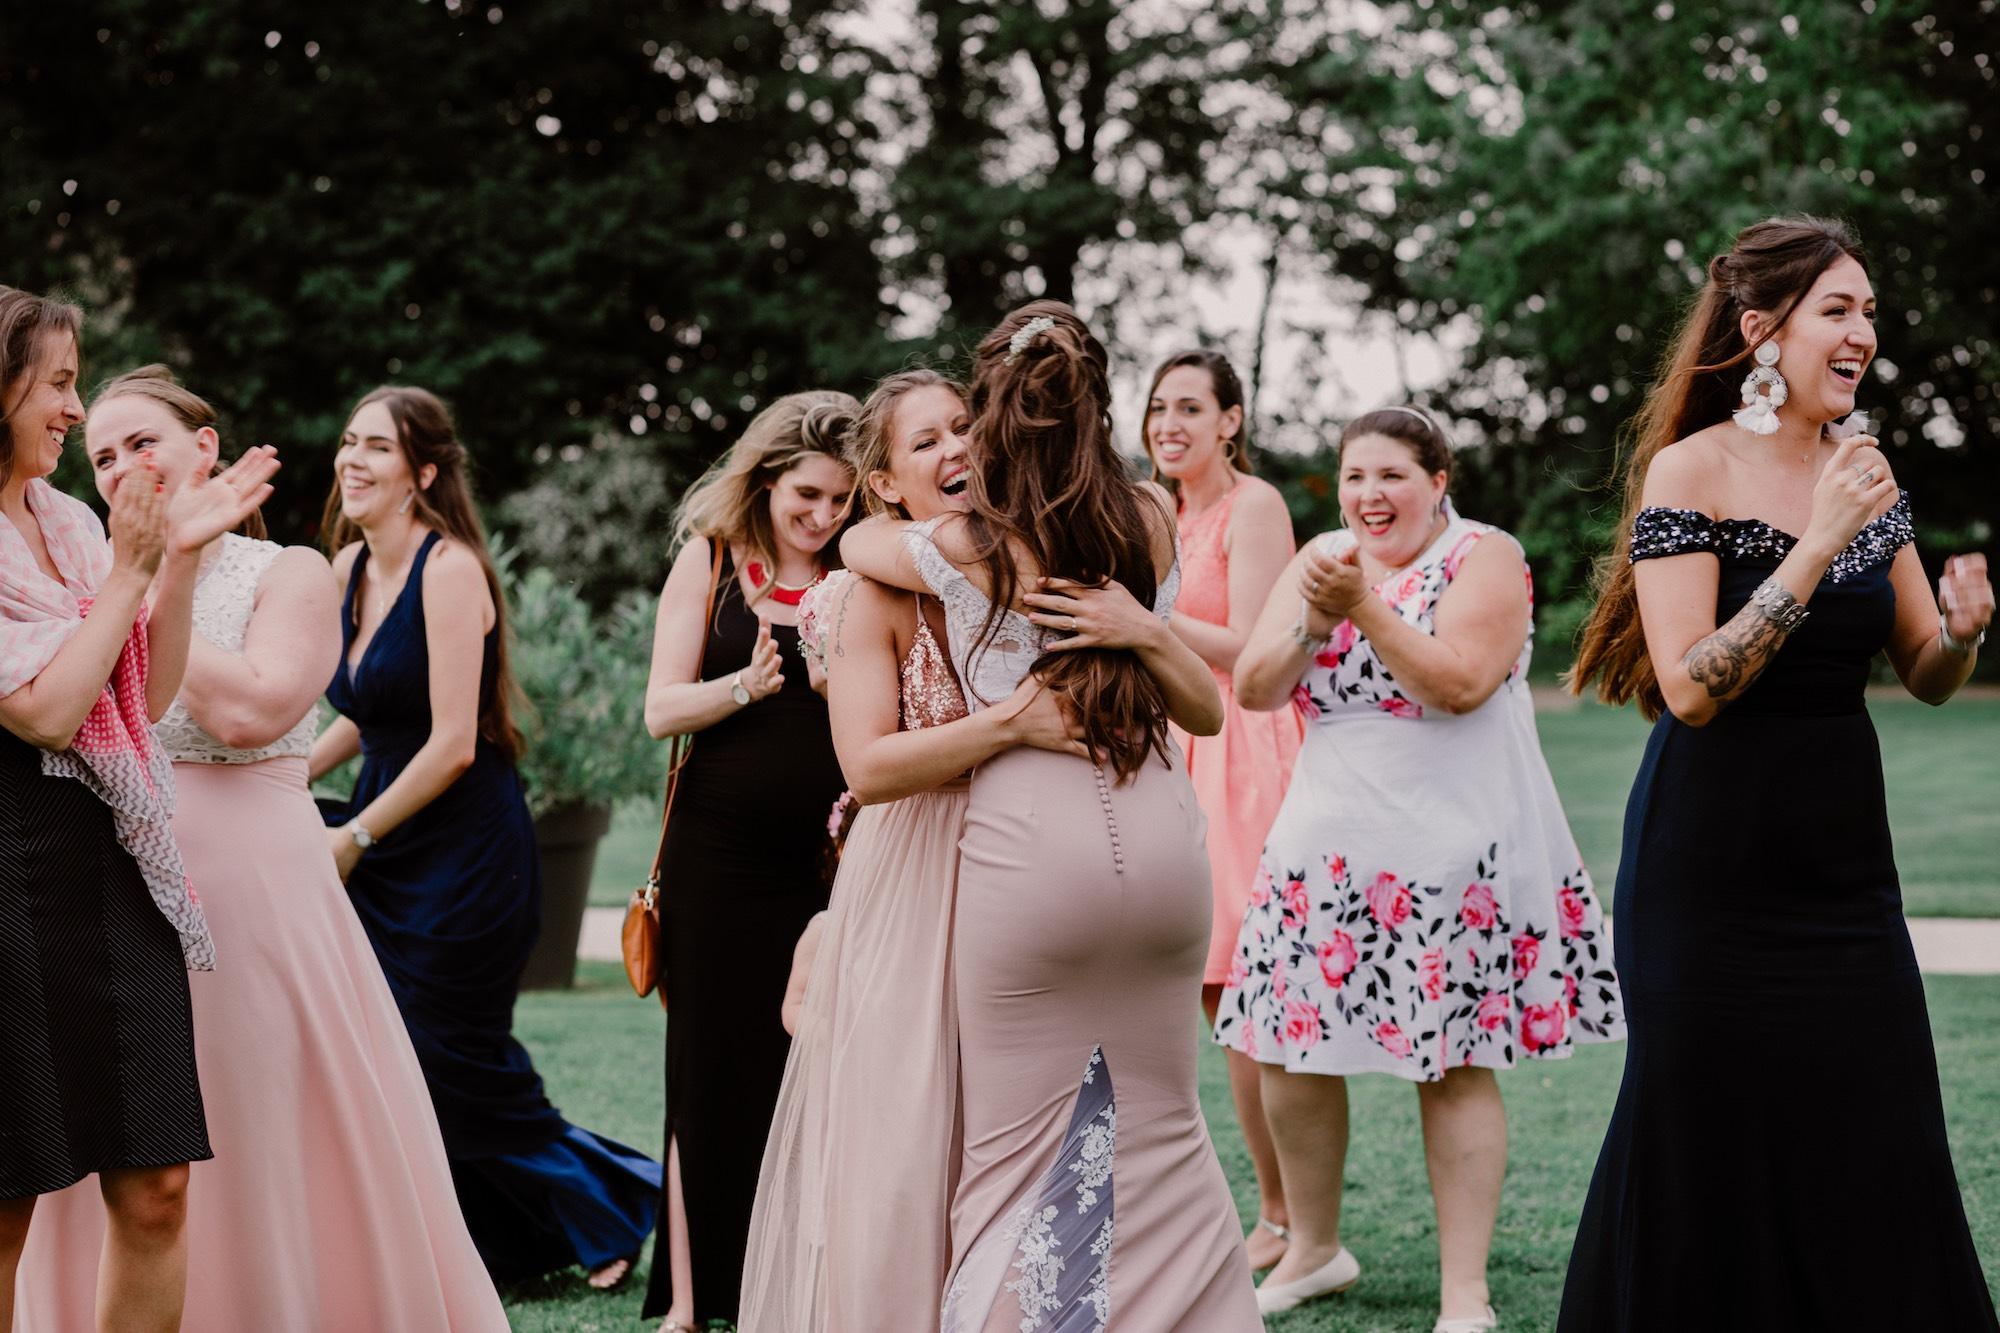 Mariage Elodie Philippe 401 - Dagmara Bojenko - Eco-conscious Weddings, Births & Families